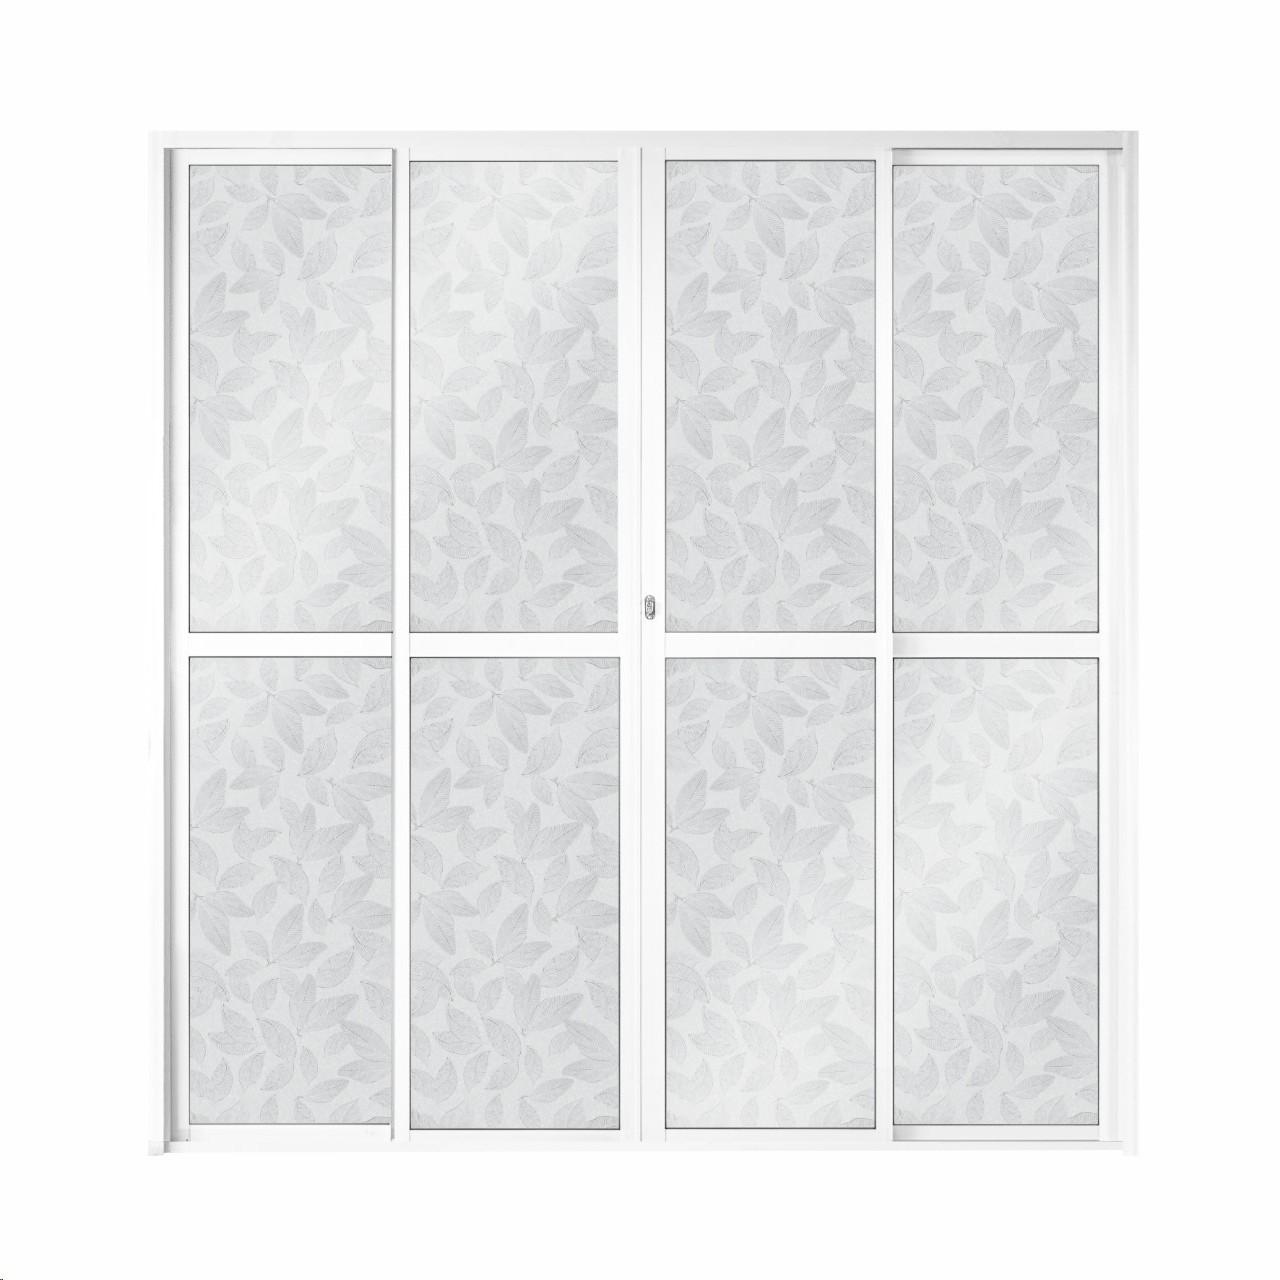 Porta Balcao de Aluminio 4 Folhas 210x200cm Branca - 921907 - Aluvid